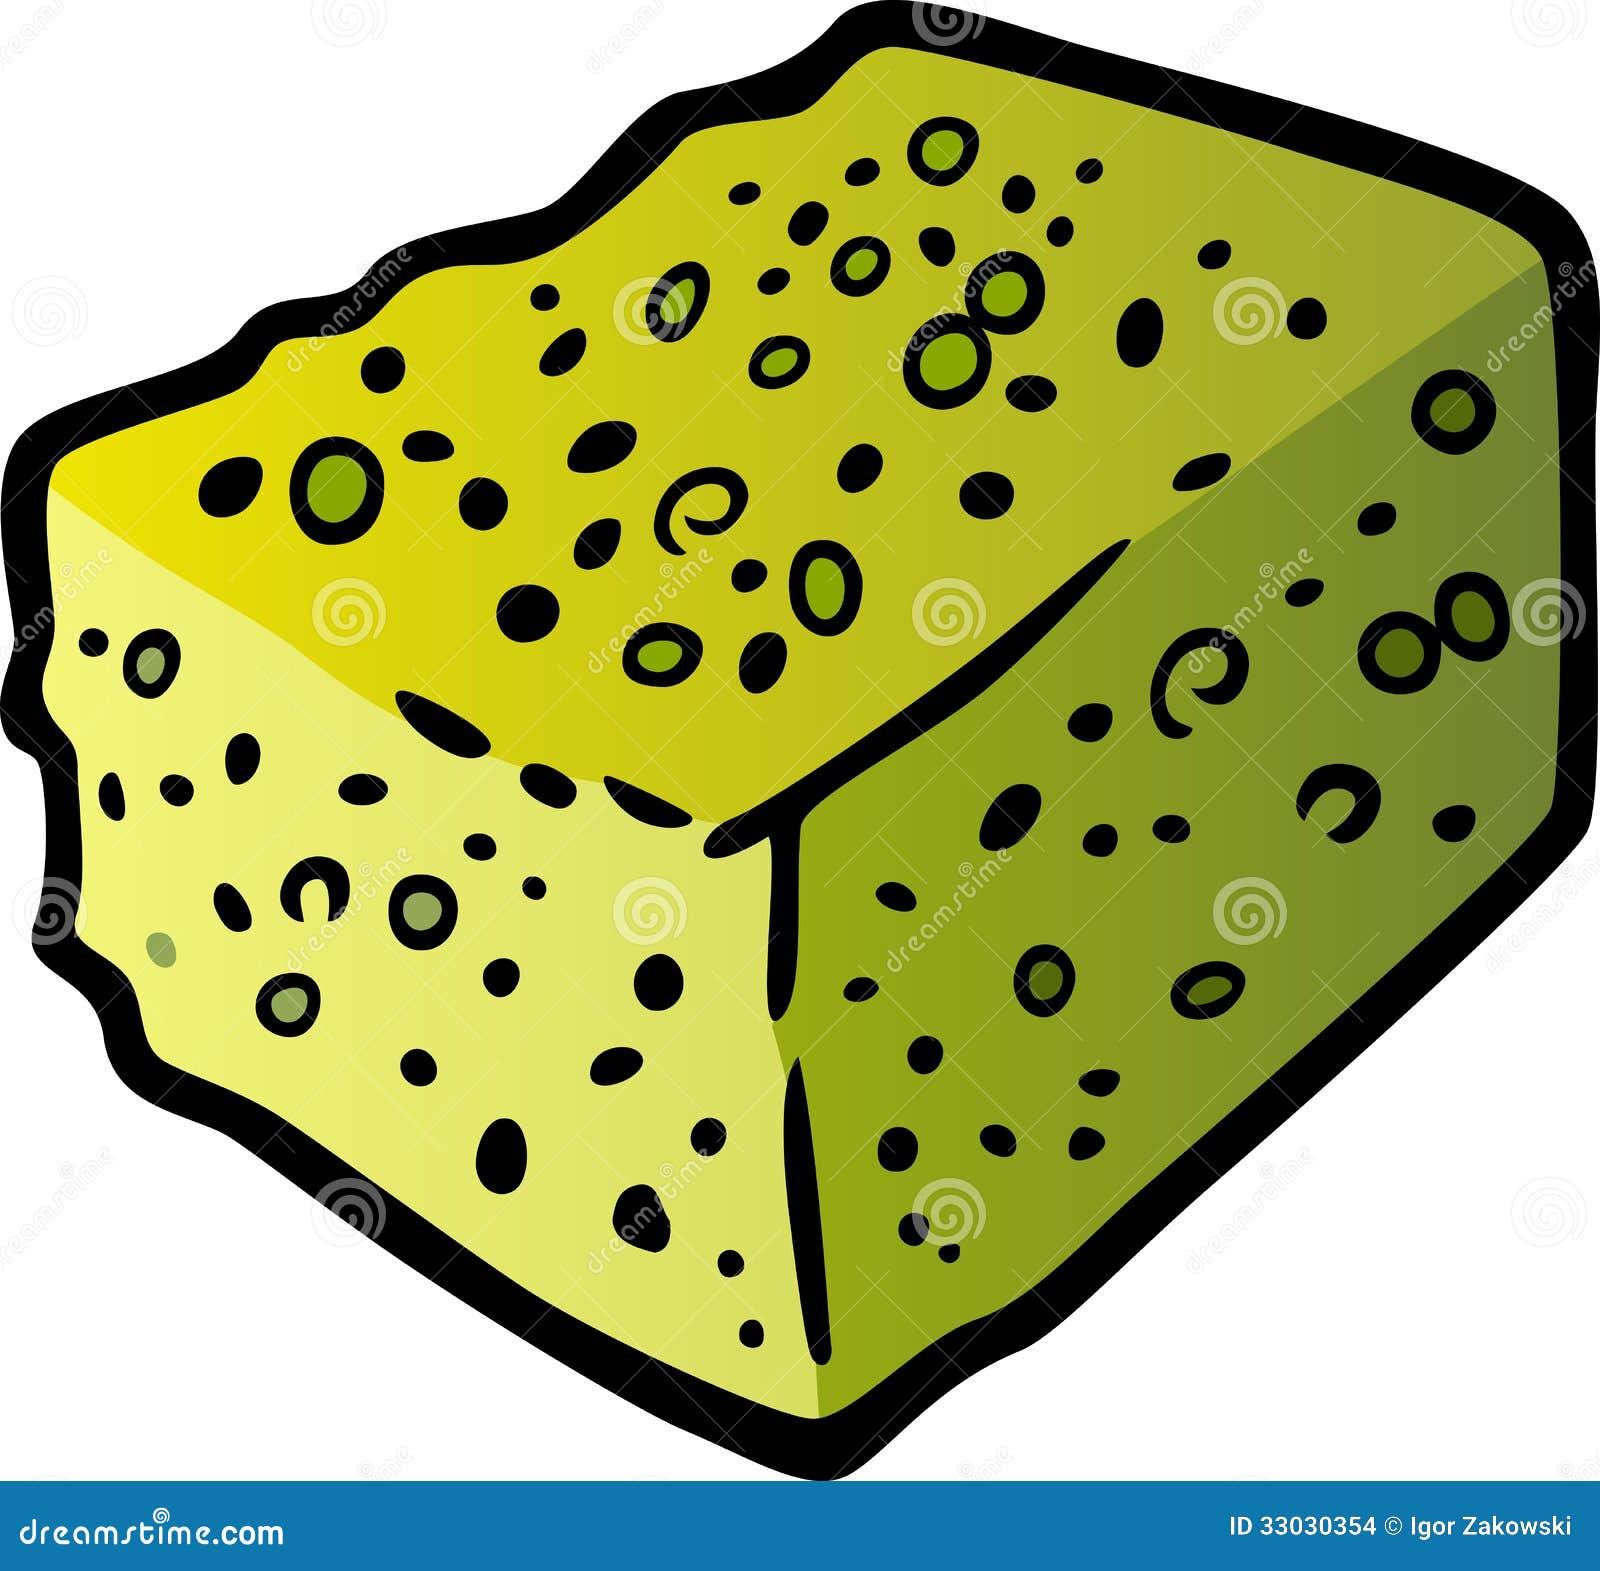 Sponge Clip Art Cartoon Illustration Stock Images - Image: 33030354